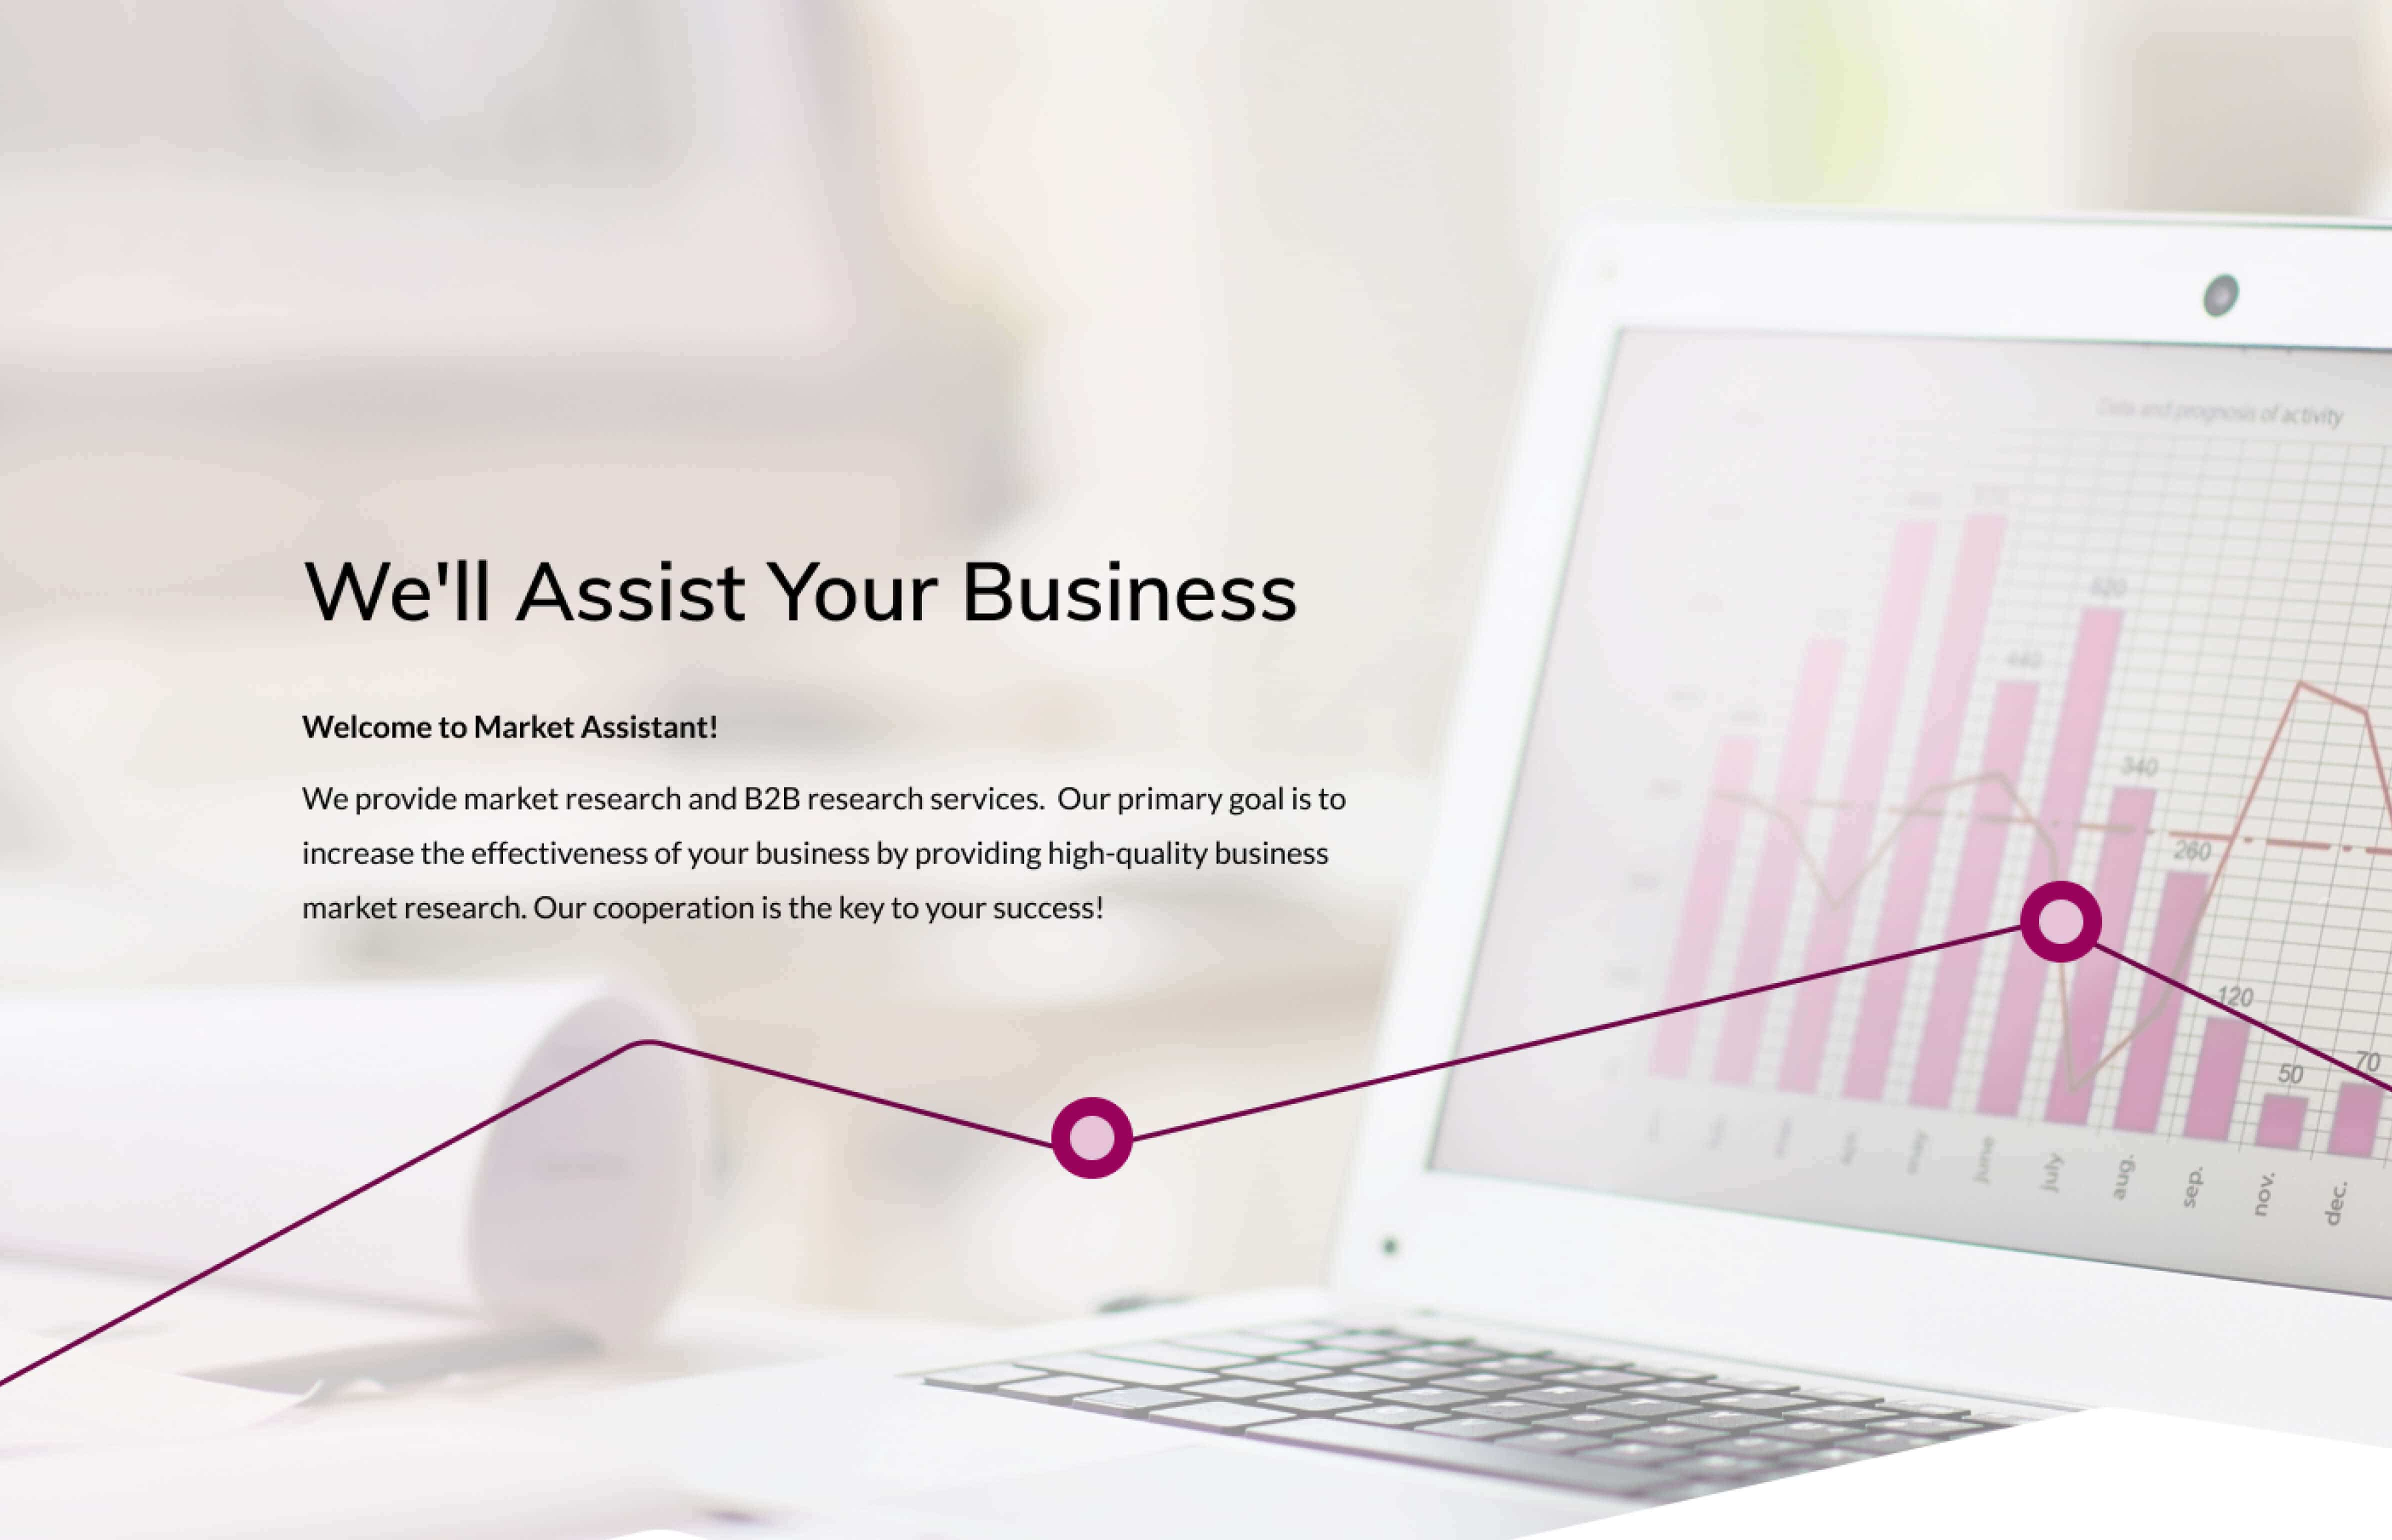 Market Assistant website